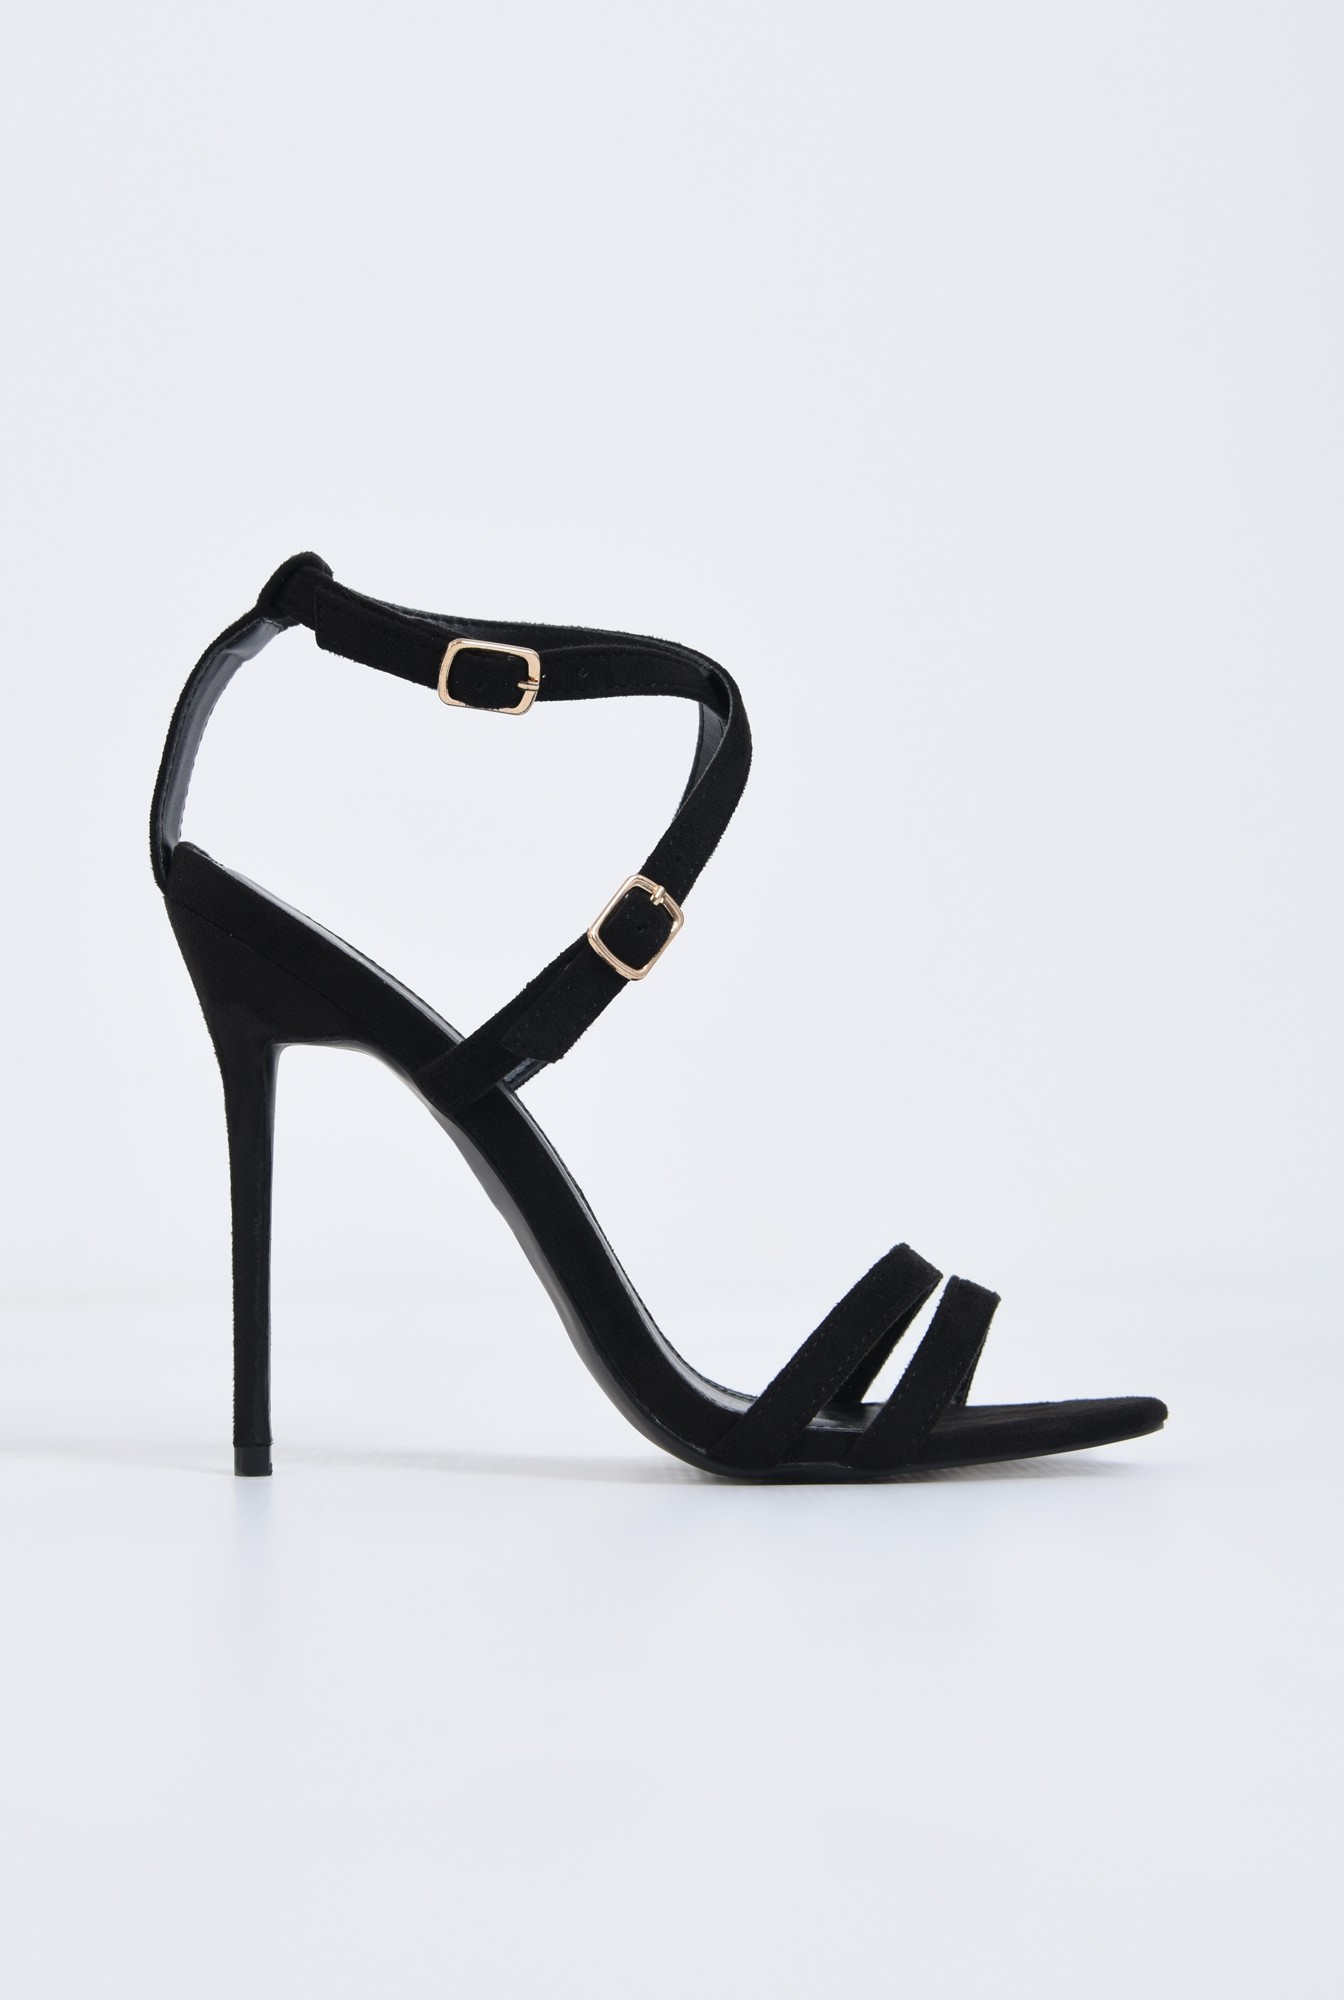 sandale elegante, negru, stiletto, catifea